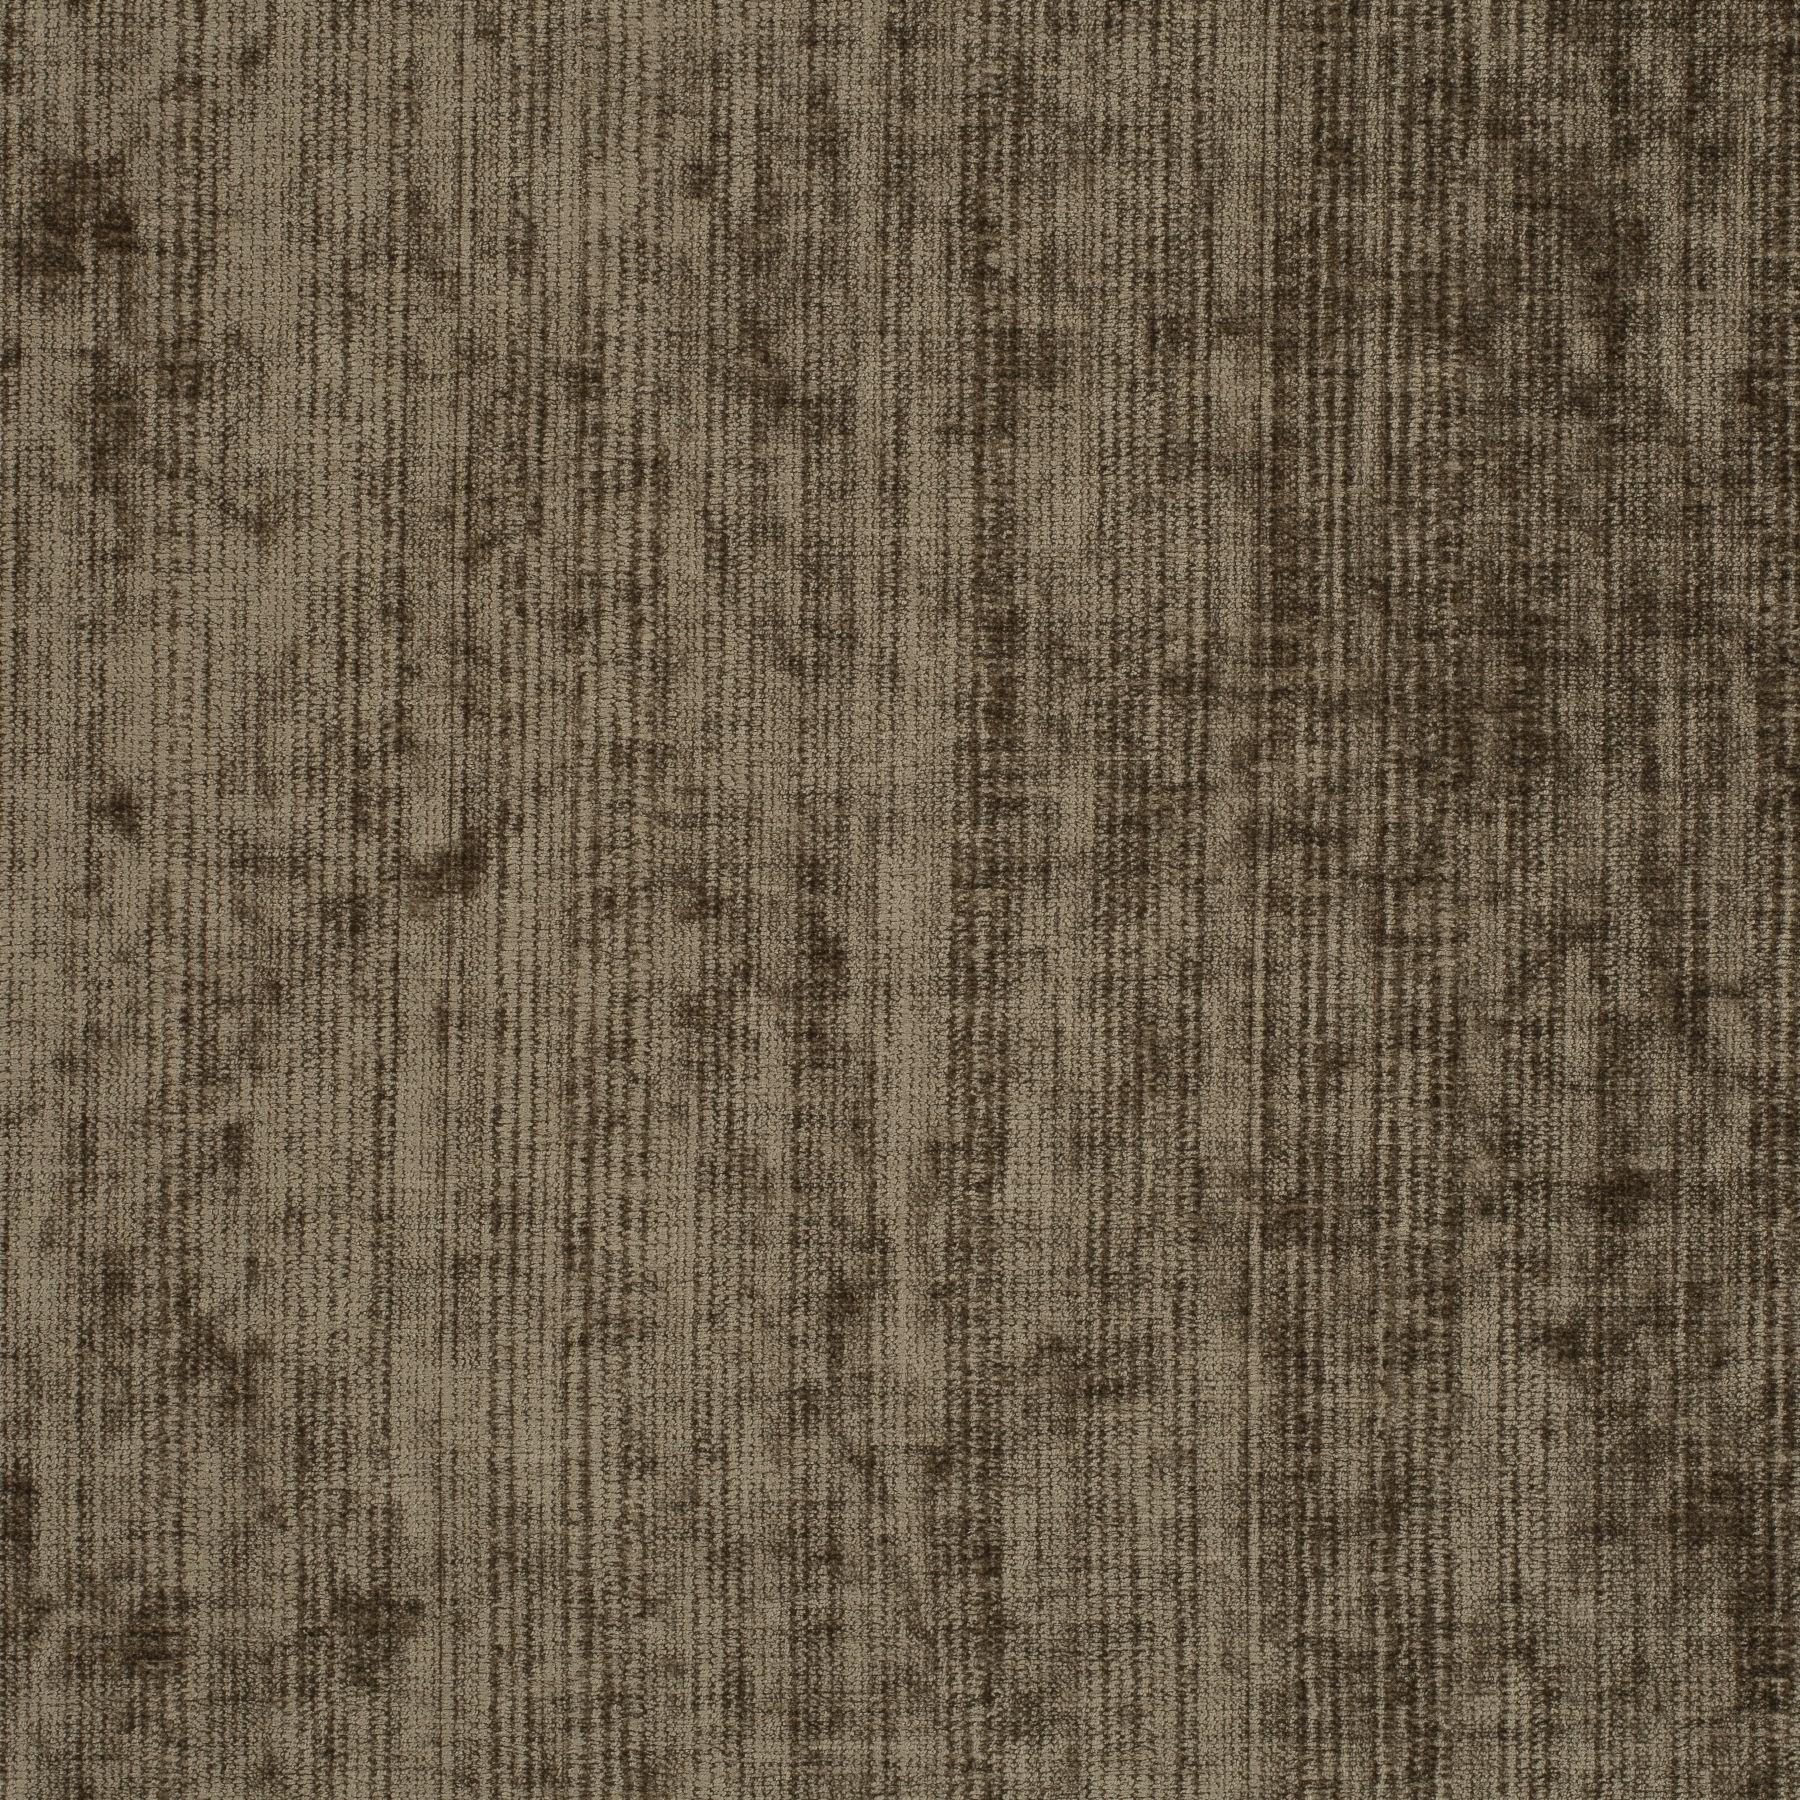 Upholstery Fabric Norman 1 1326 030 Jab Anstoetz Fabrics